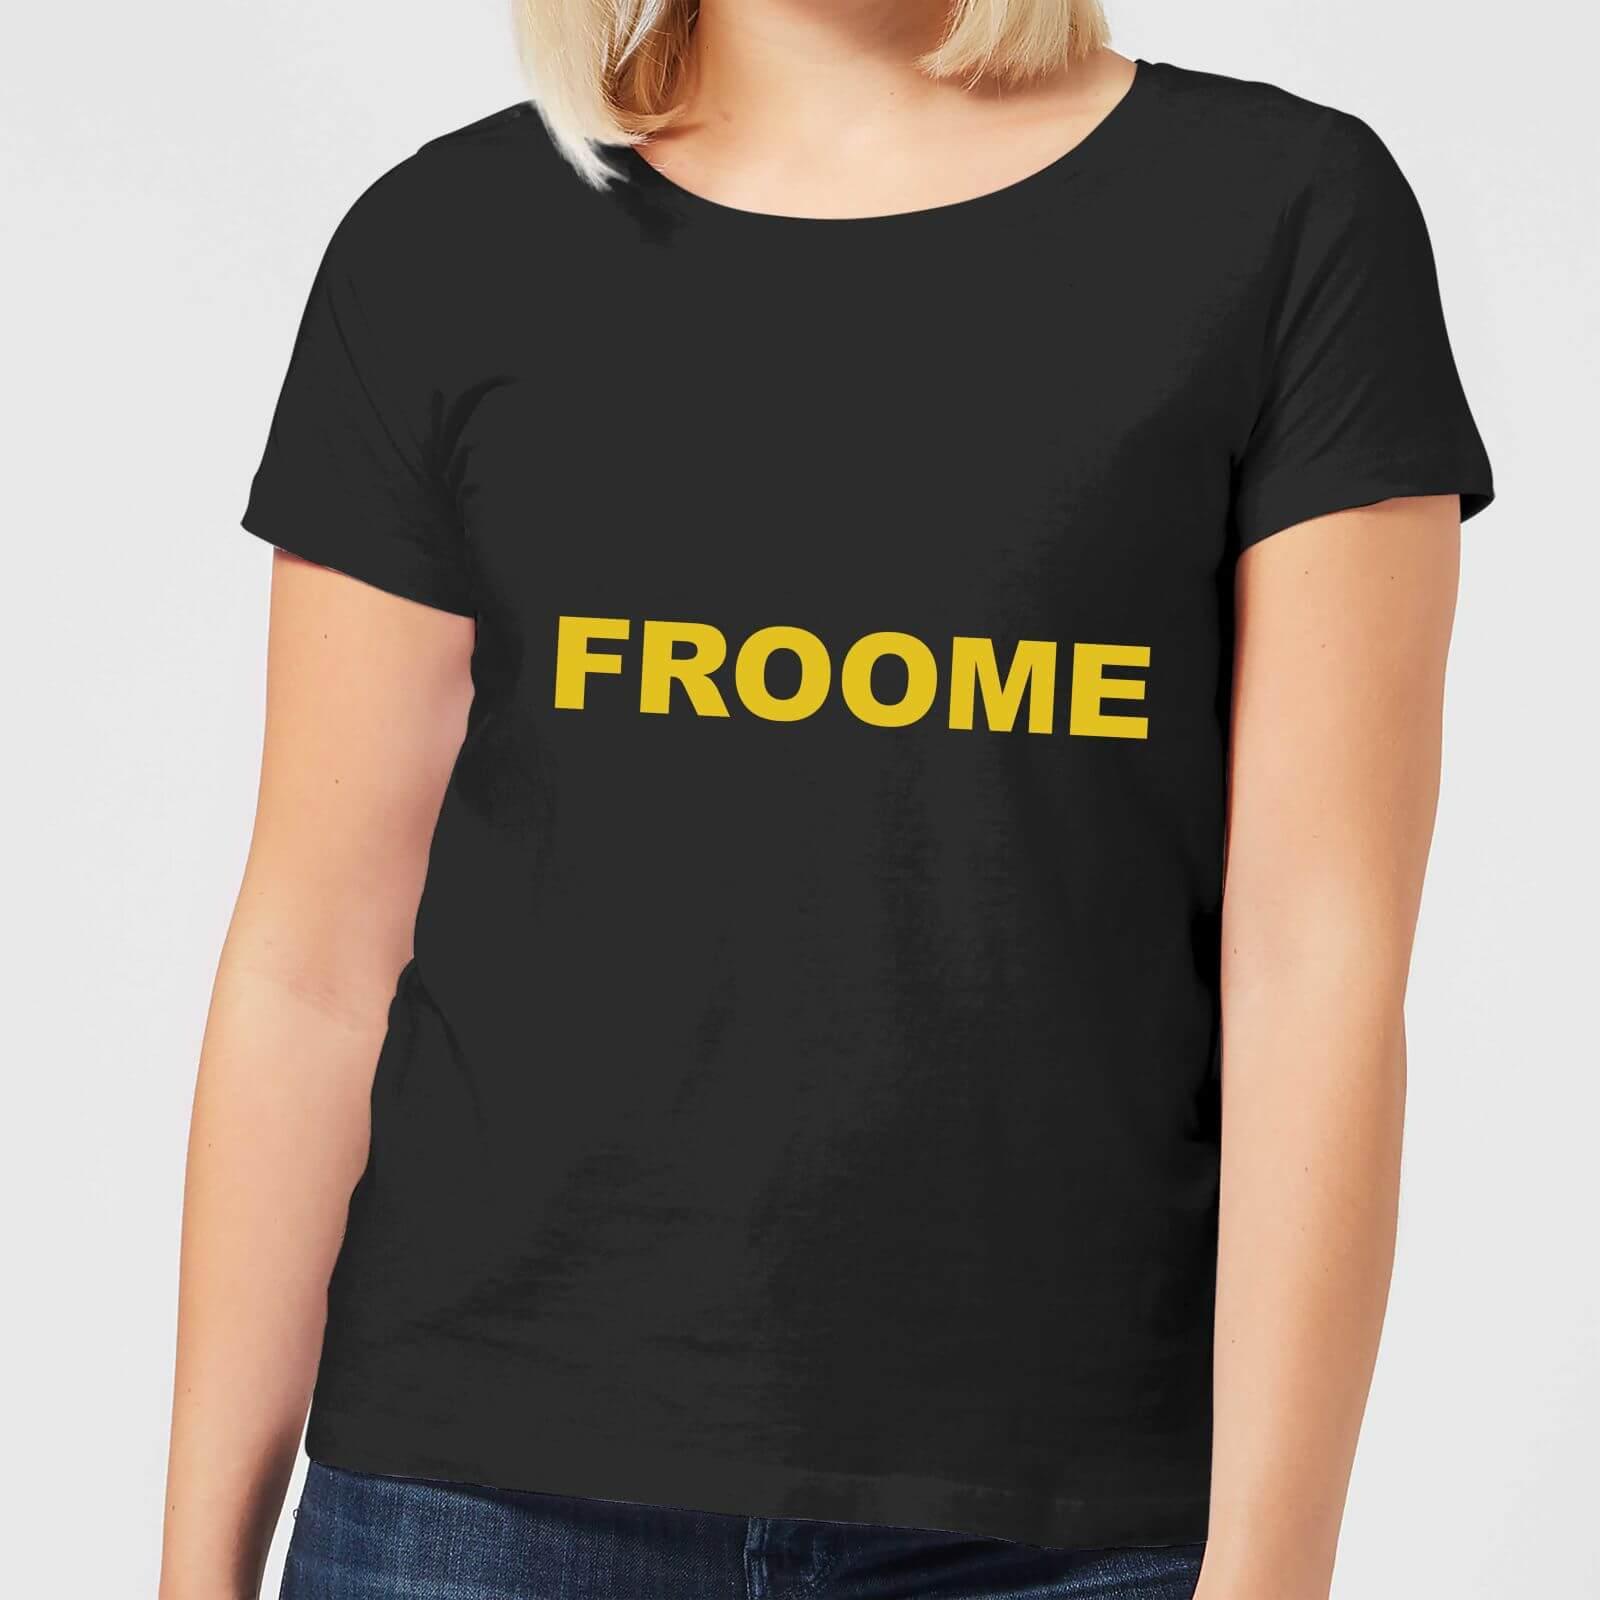 941f76c9 Summit Finish Froome - Rider Name Women's T-Shirt - Black | IWOOT